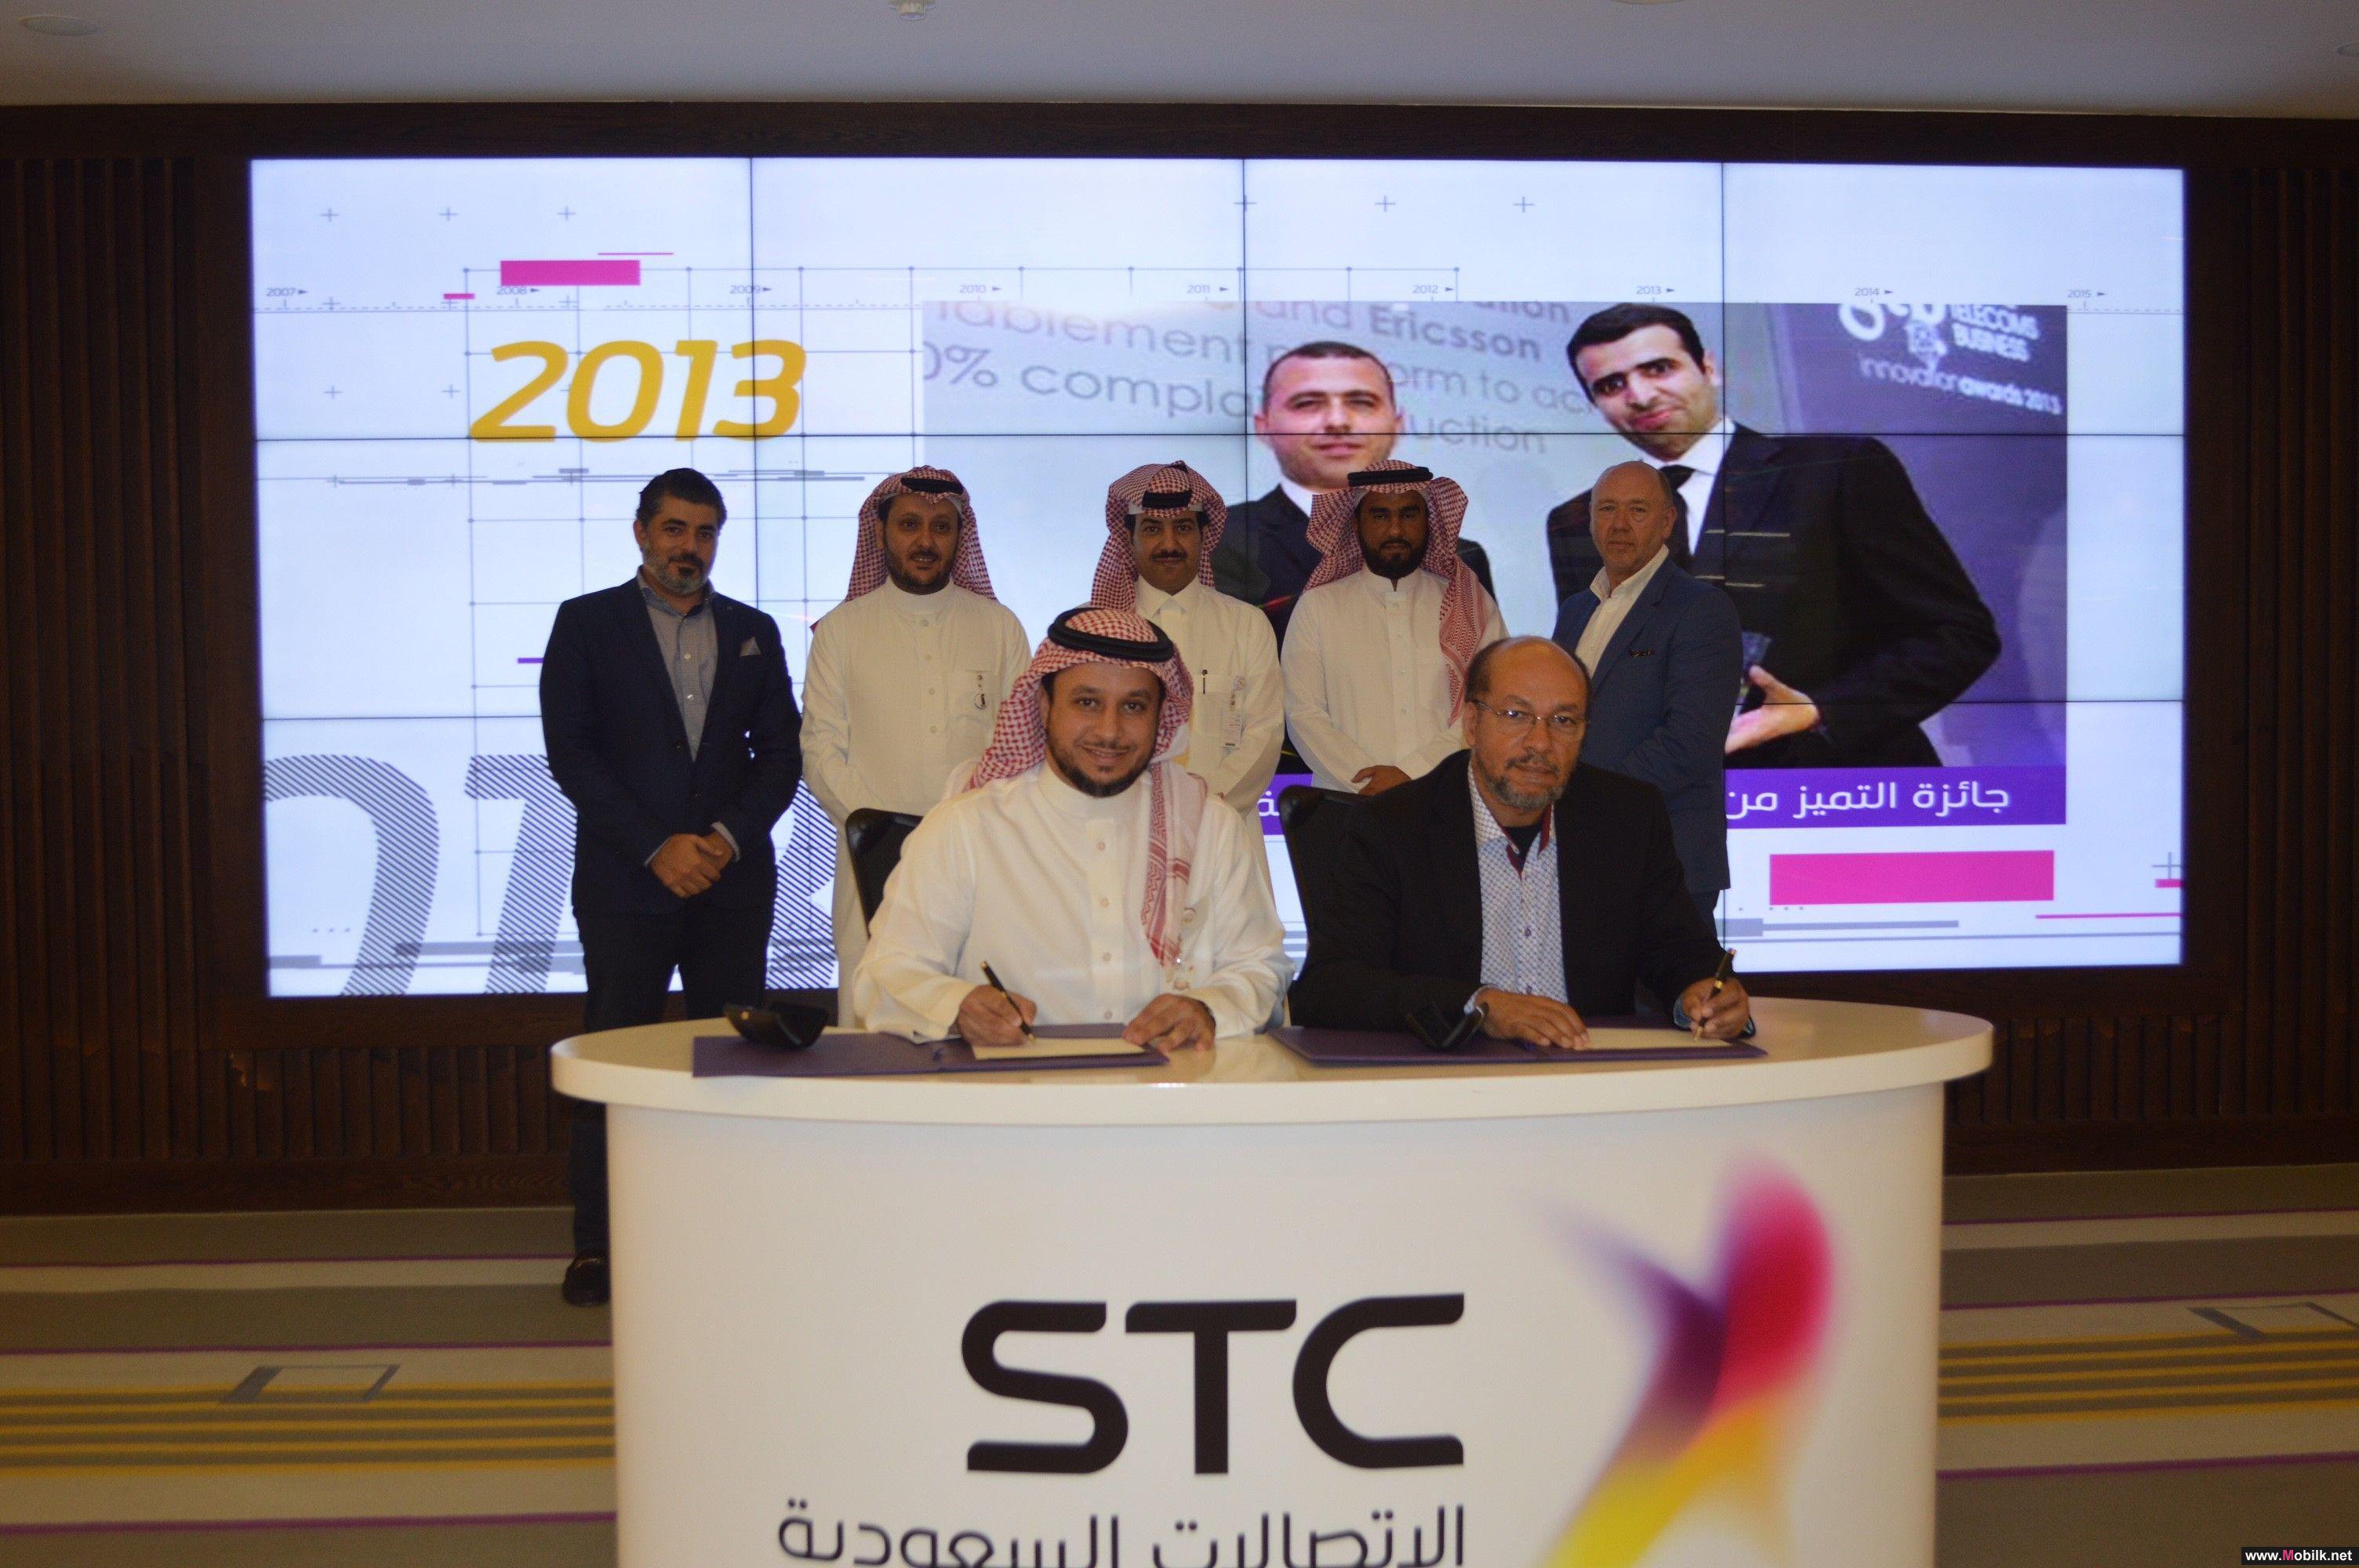 STC تنشئ منصة تبادل معلومات لتعزيز الأمن السيبراني بالتعاون مع Anomali